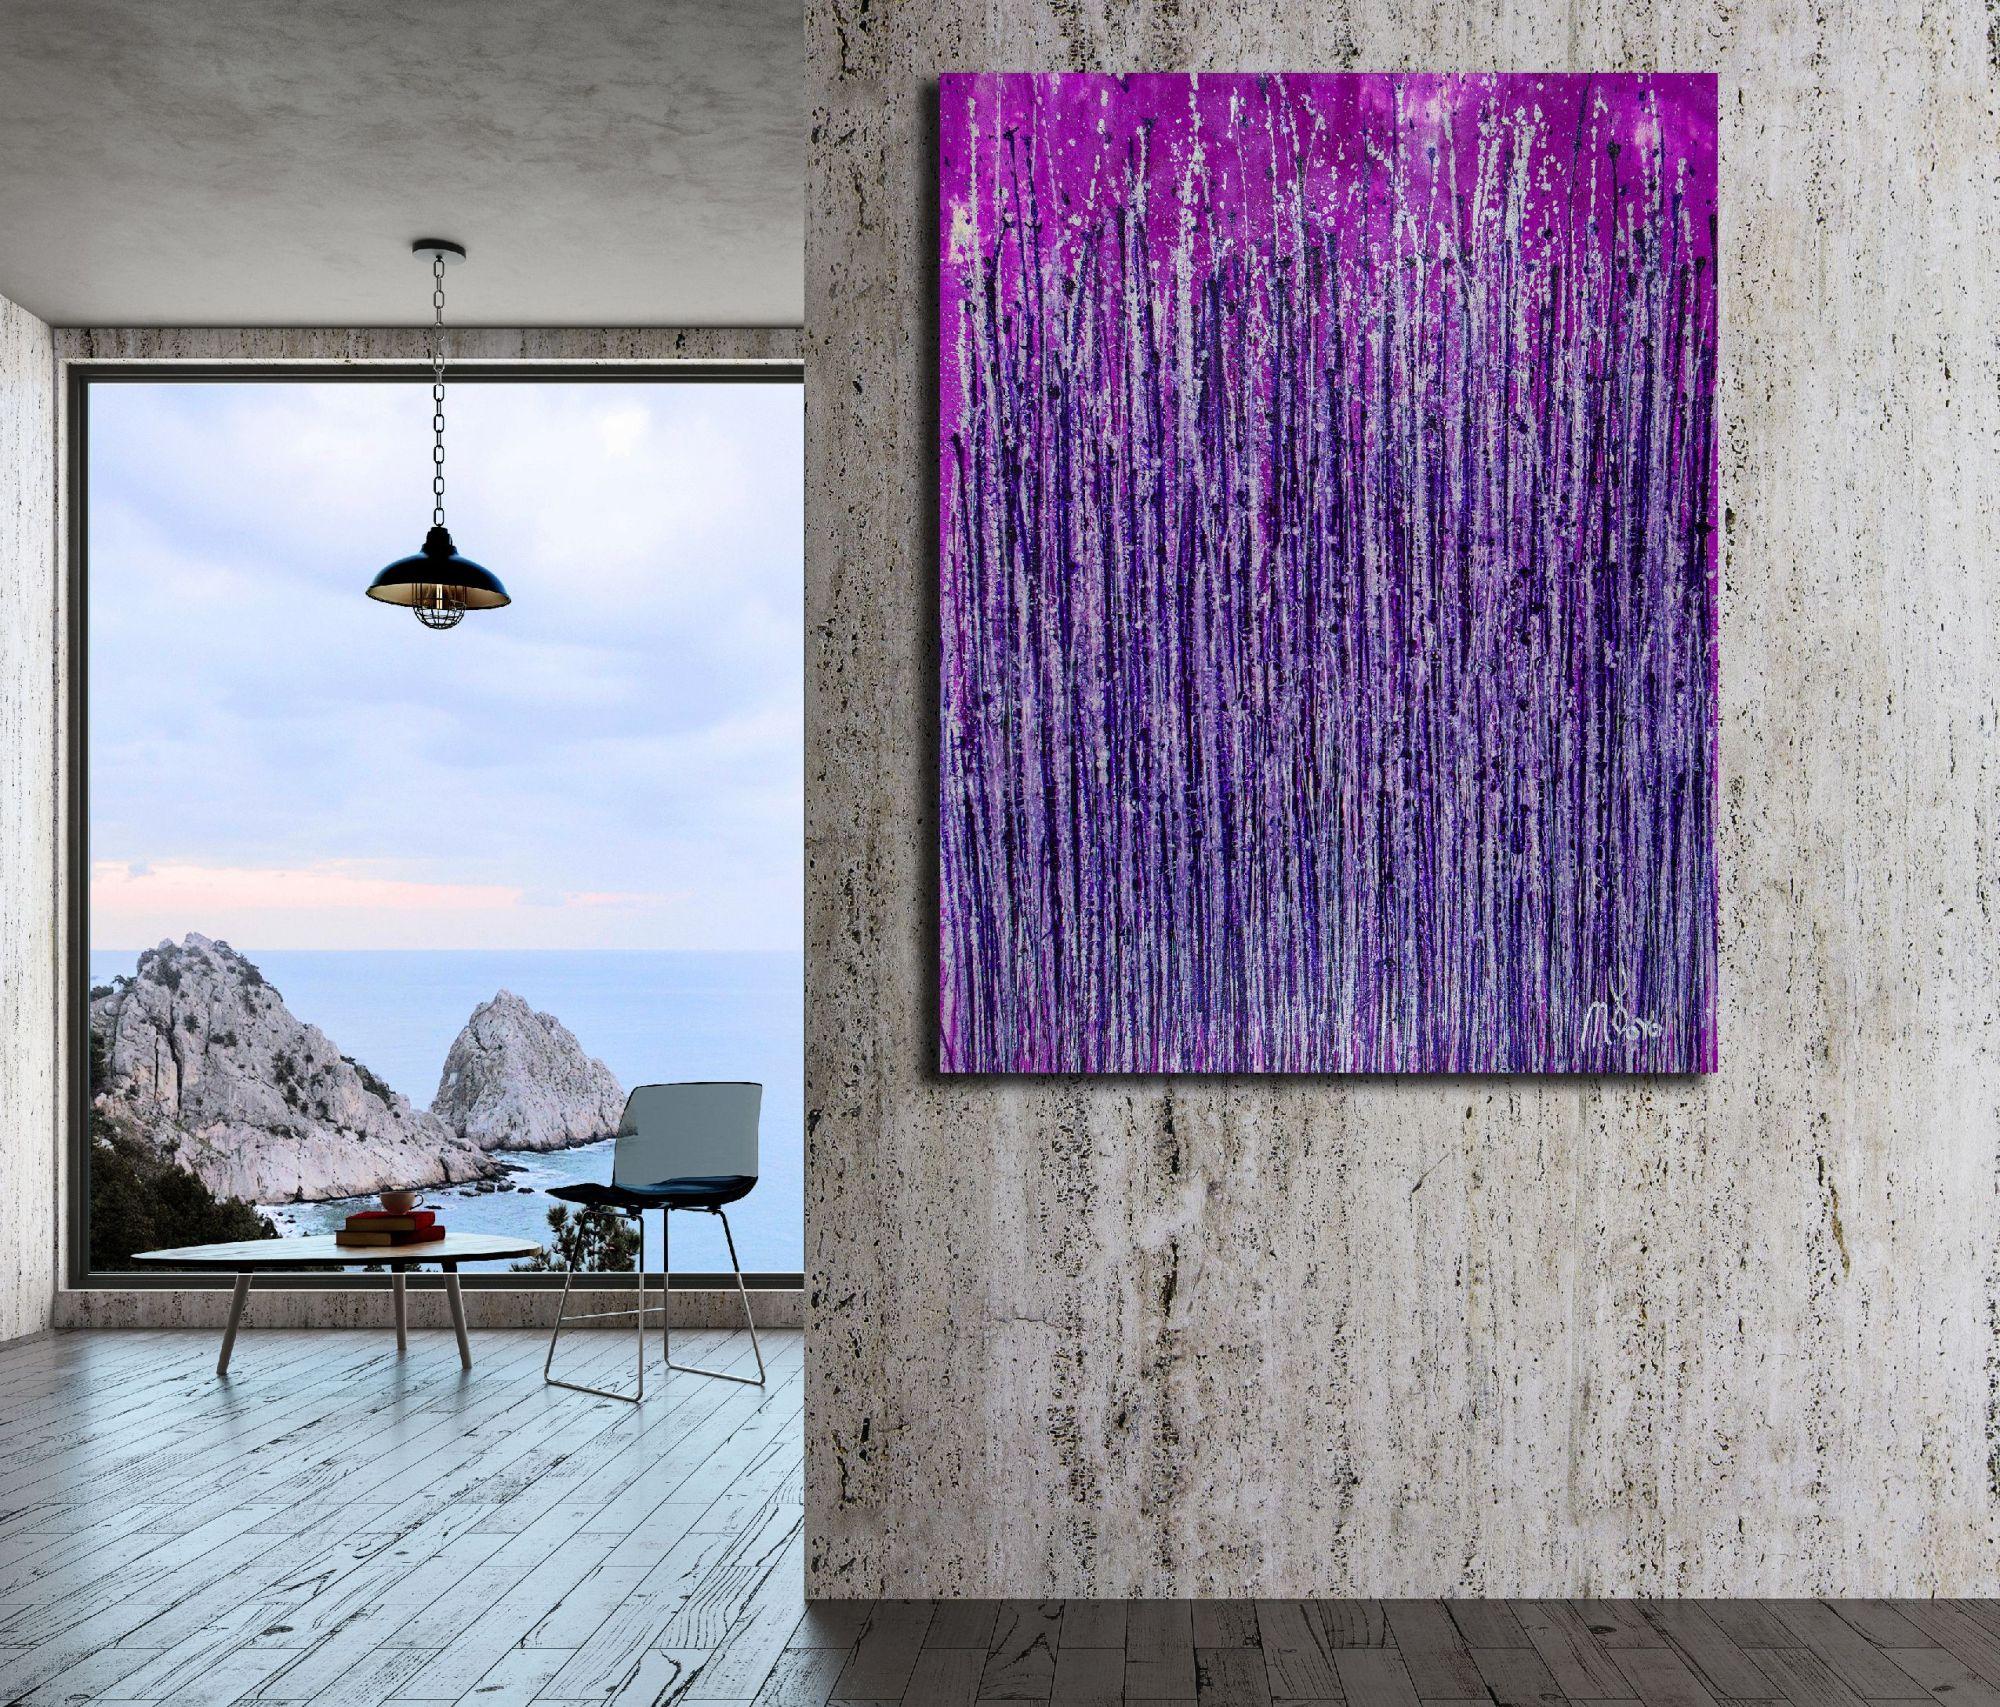 Lavish Purple Spectra (2020) by Nestor Toro